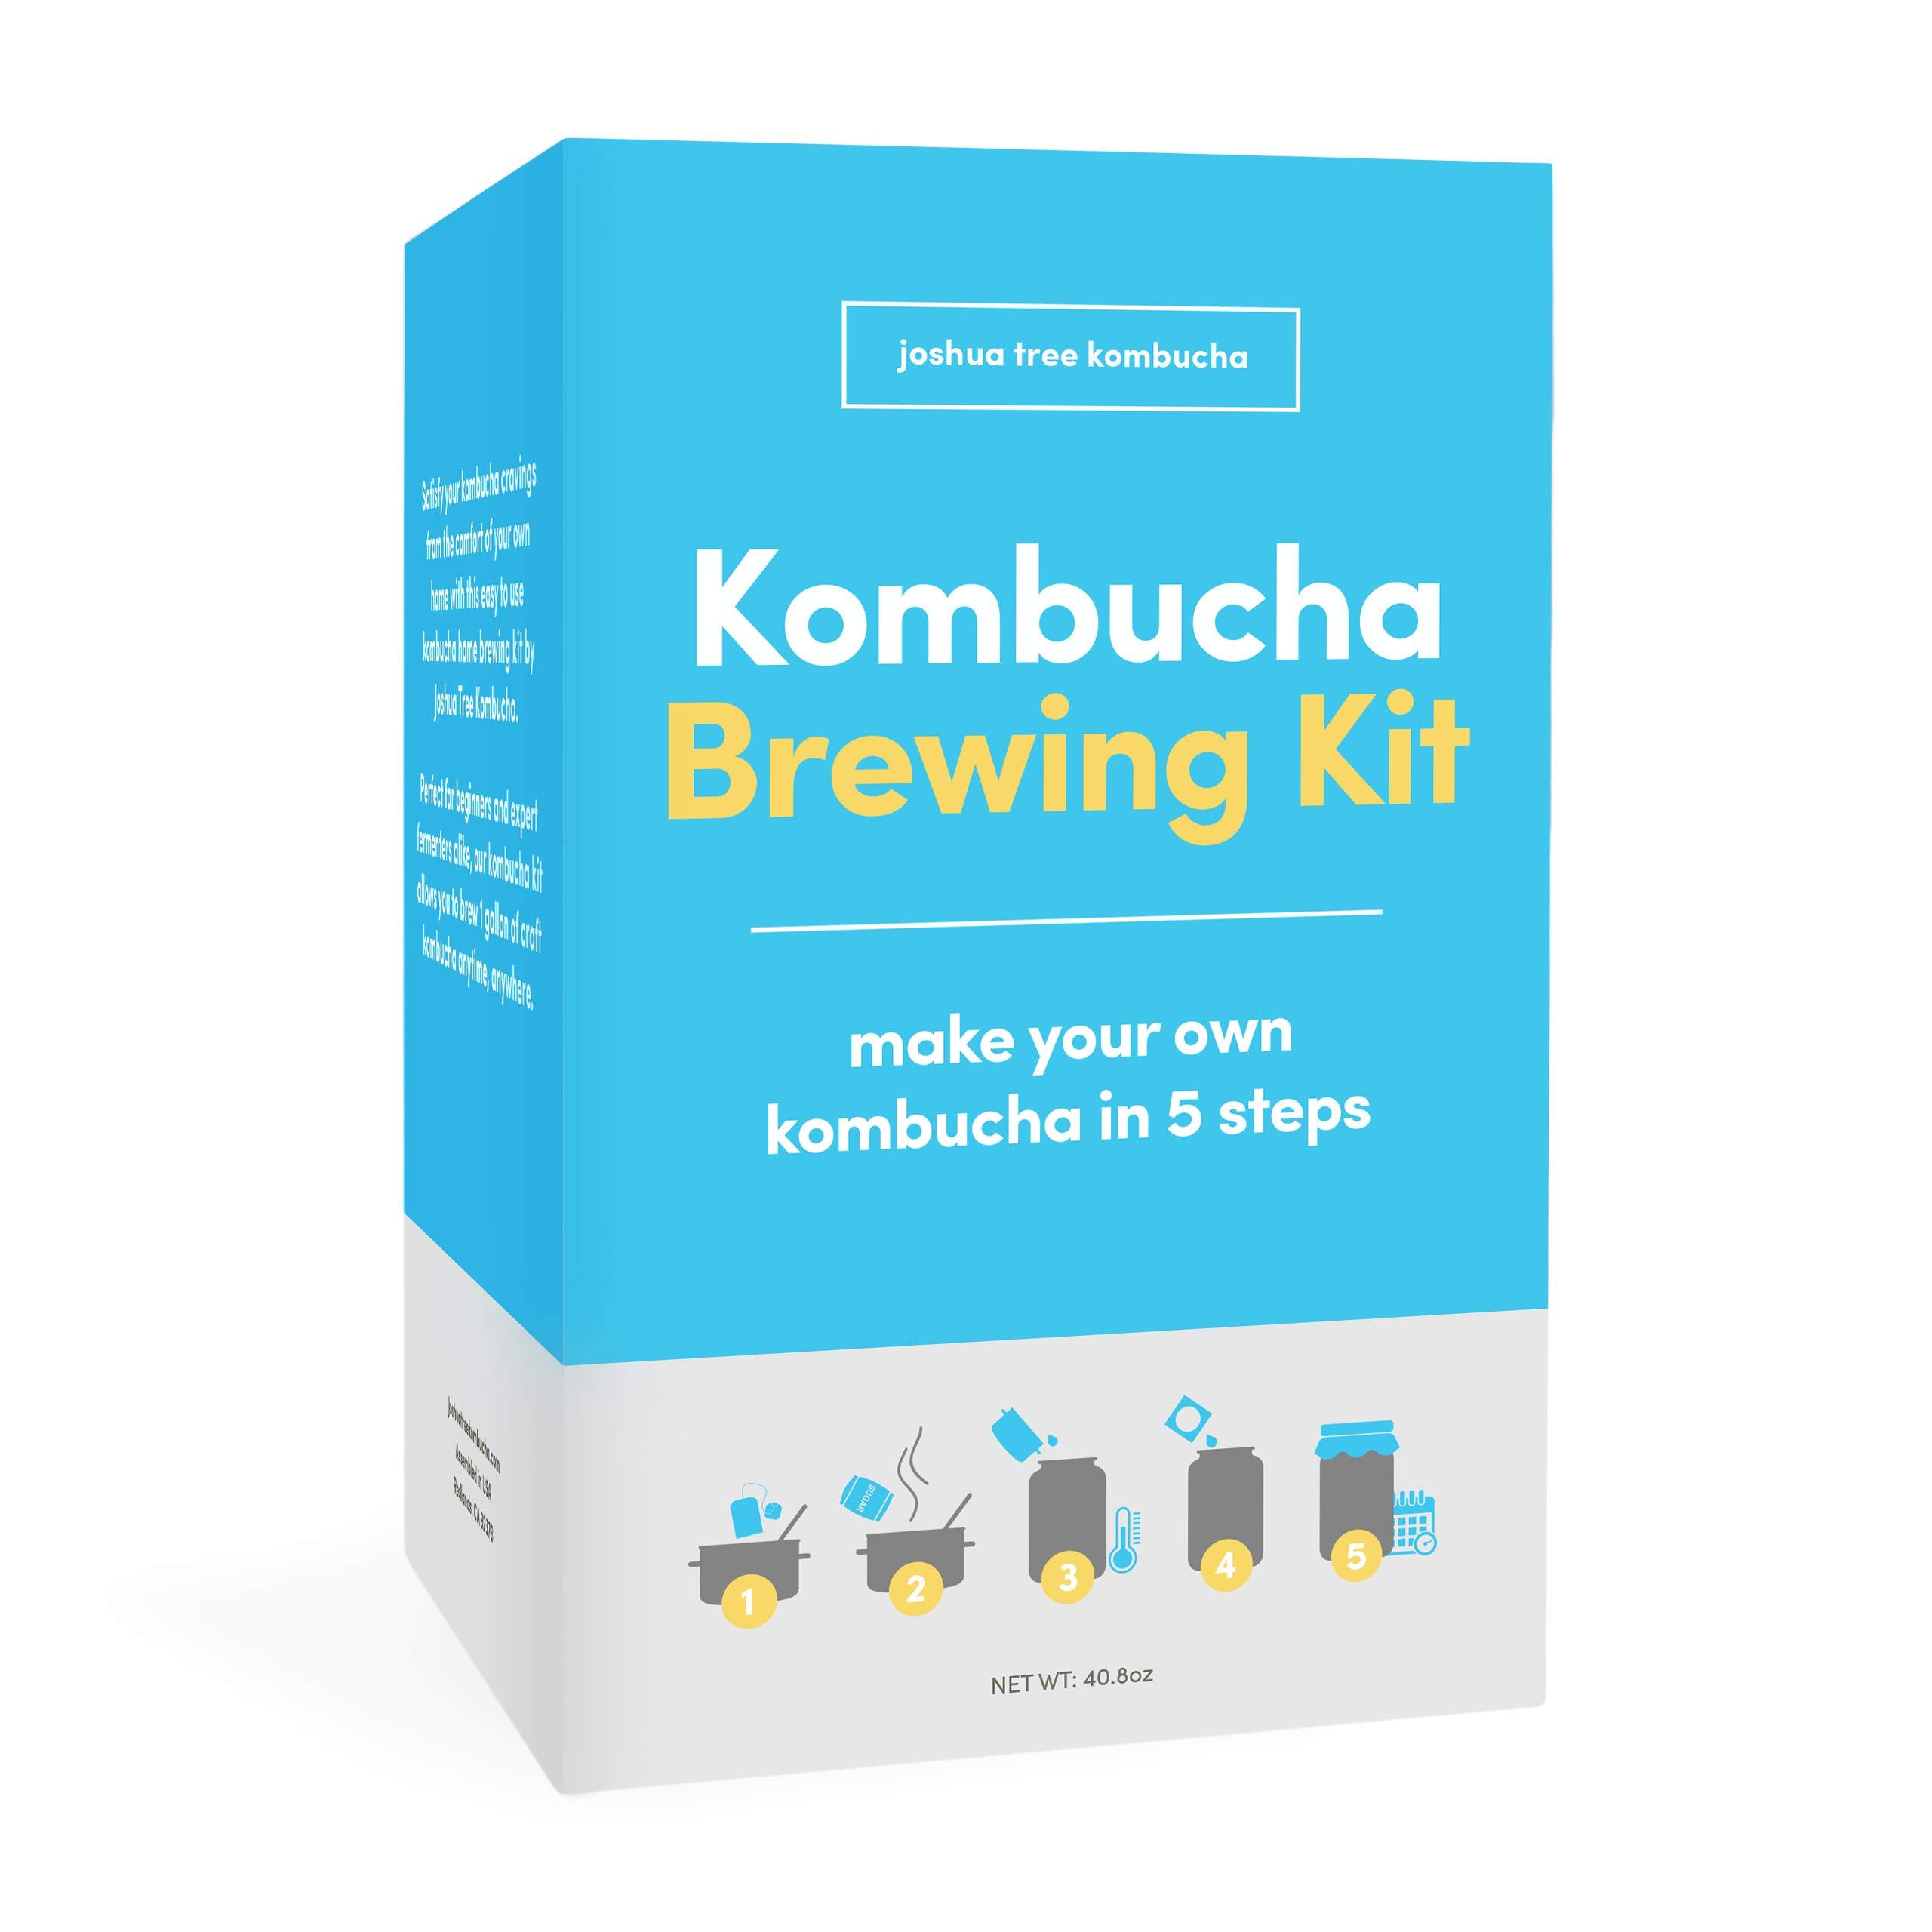 Kombucha Brewing Kit with Kombucha Scoby (Starter) by Joshua Tree Kombucha